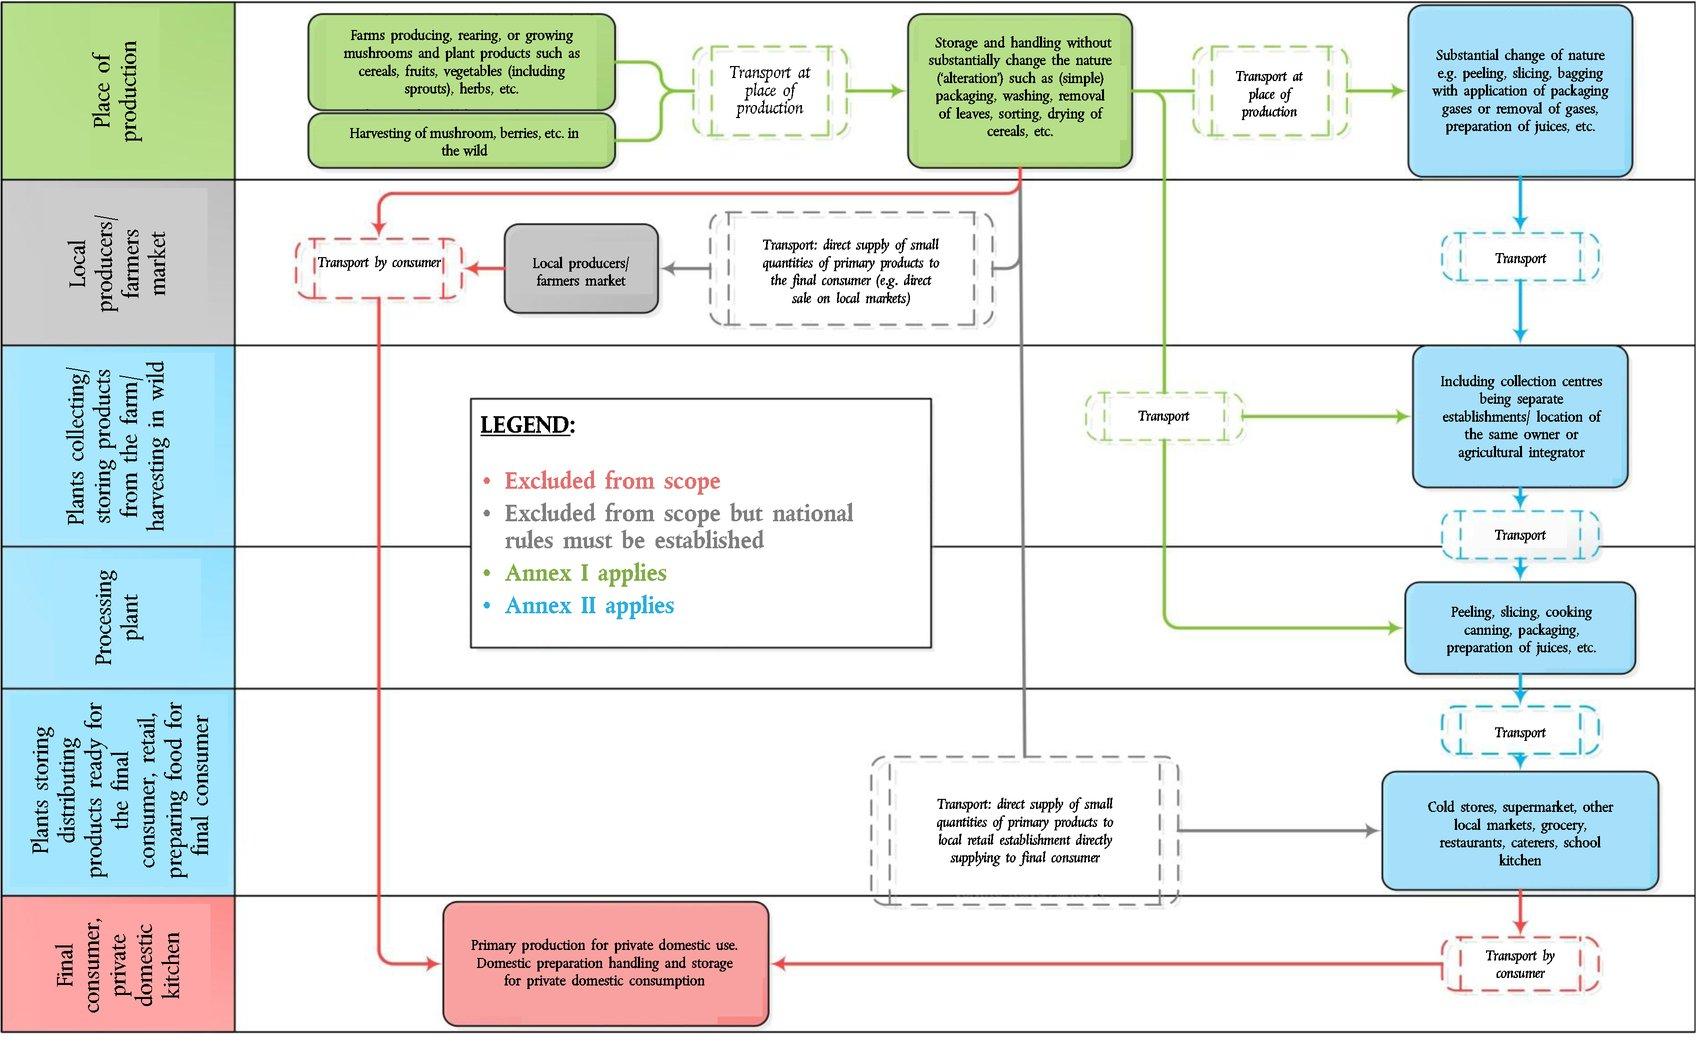 Eur Lex C2017163full En Seed Drill Diagram Better Farming Series 17 Groundnuts Fao 1977 40 Image